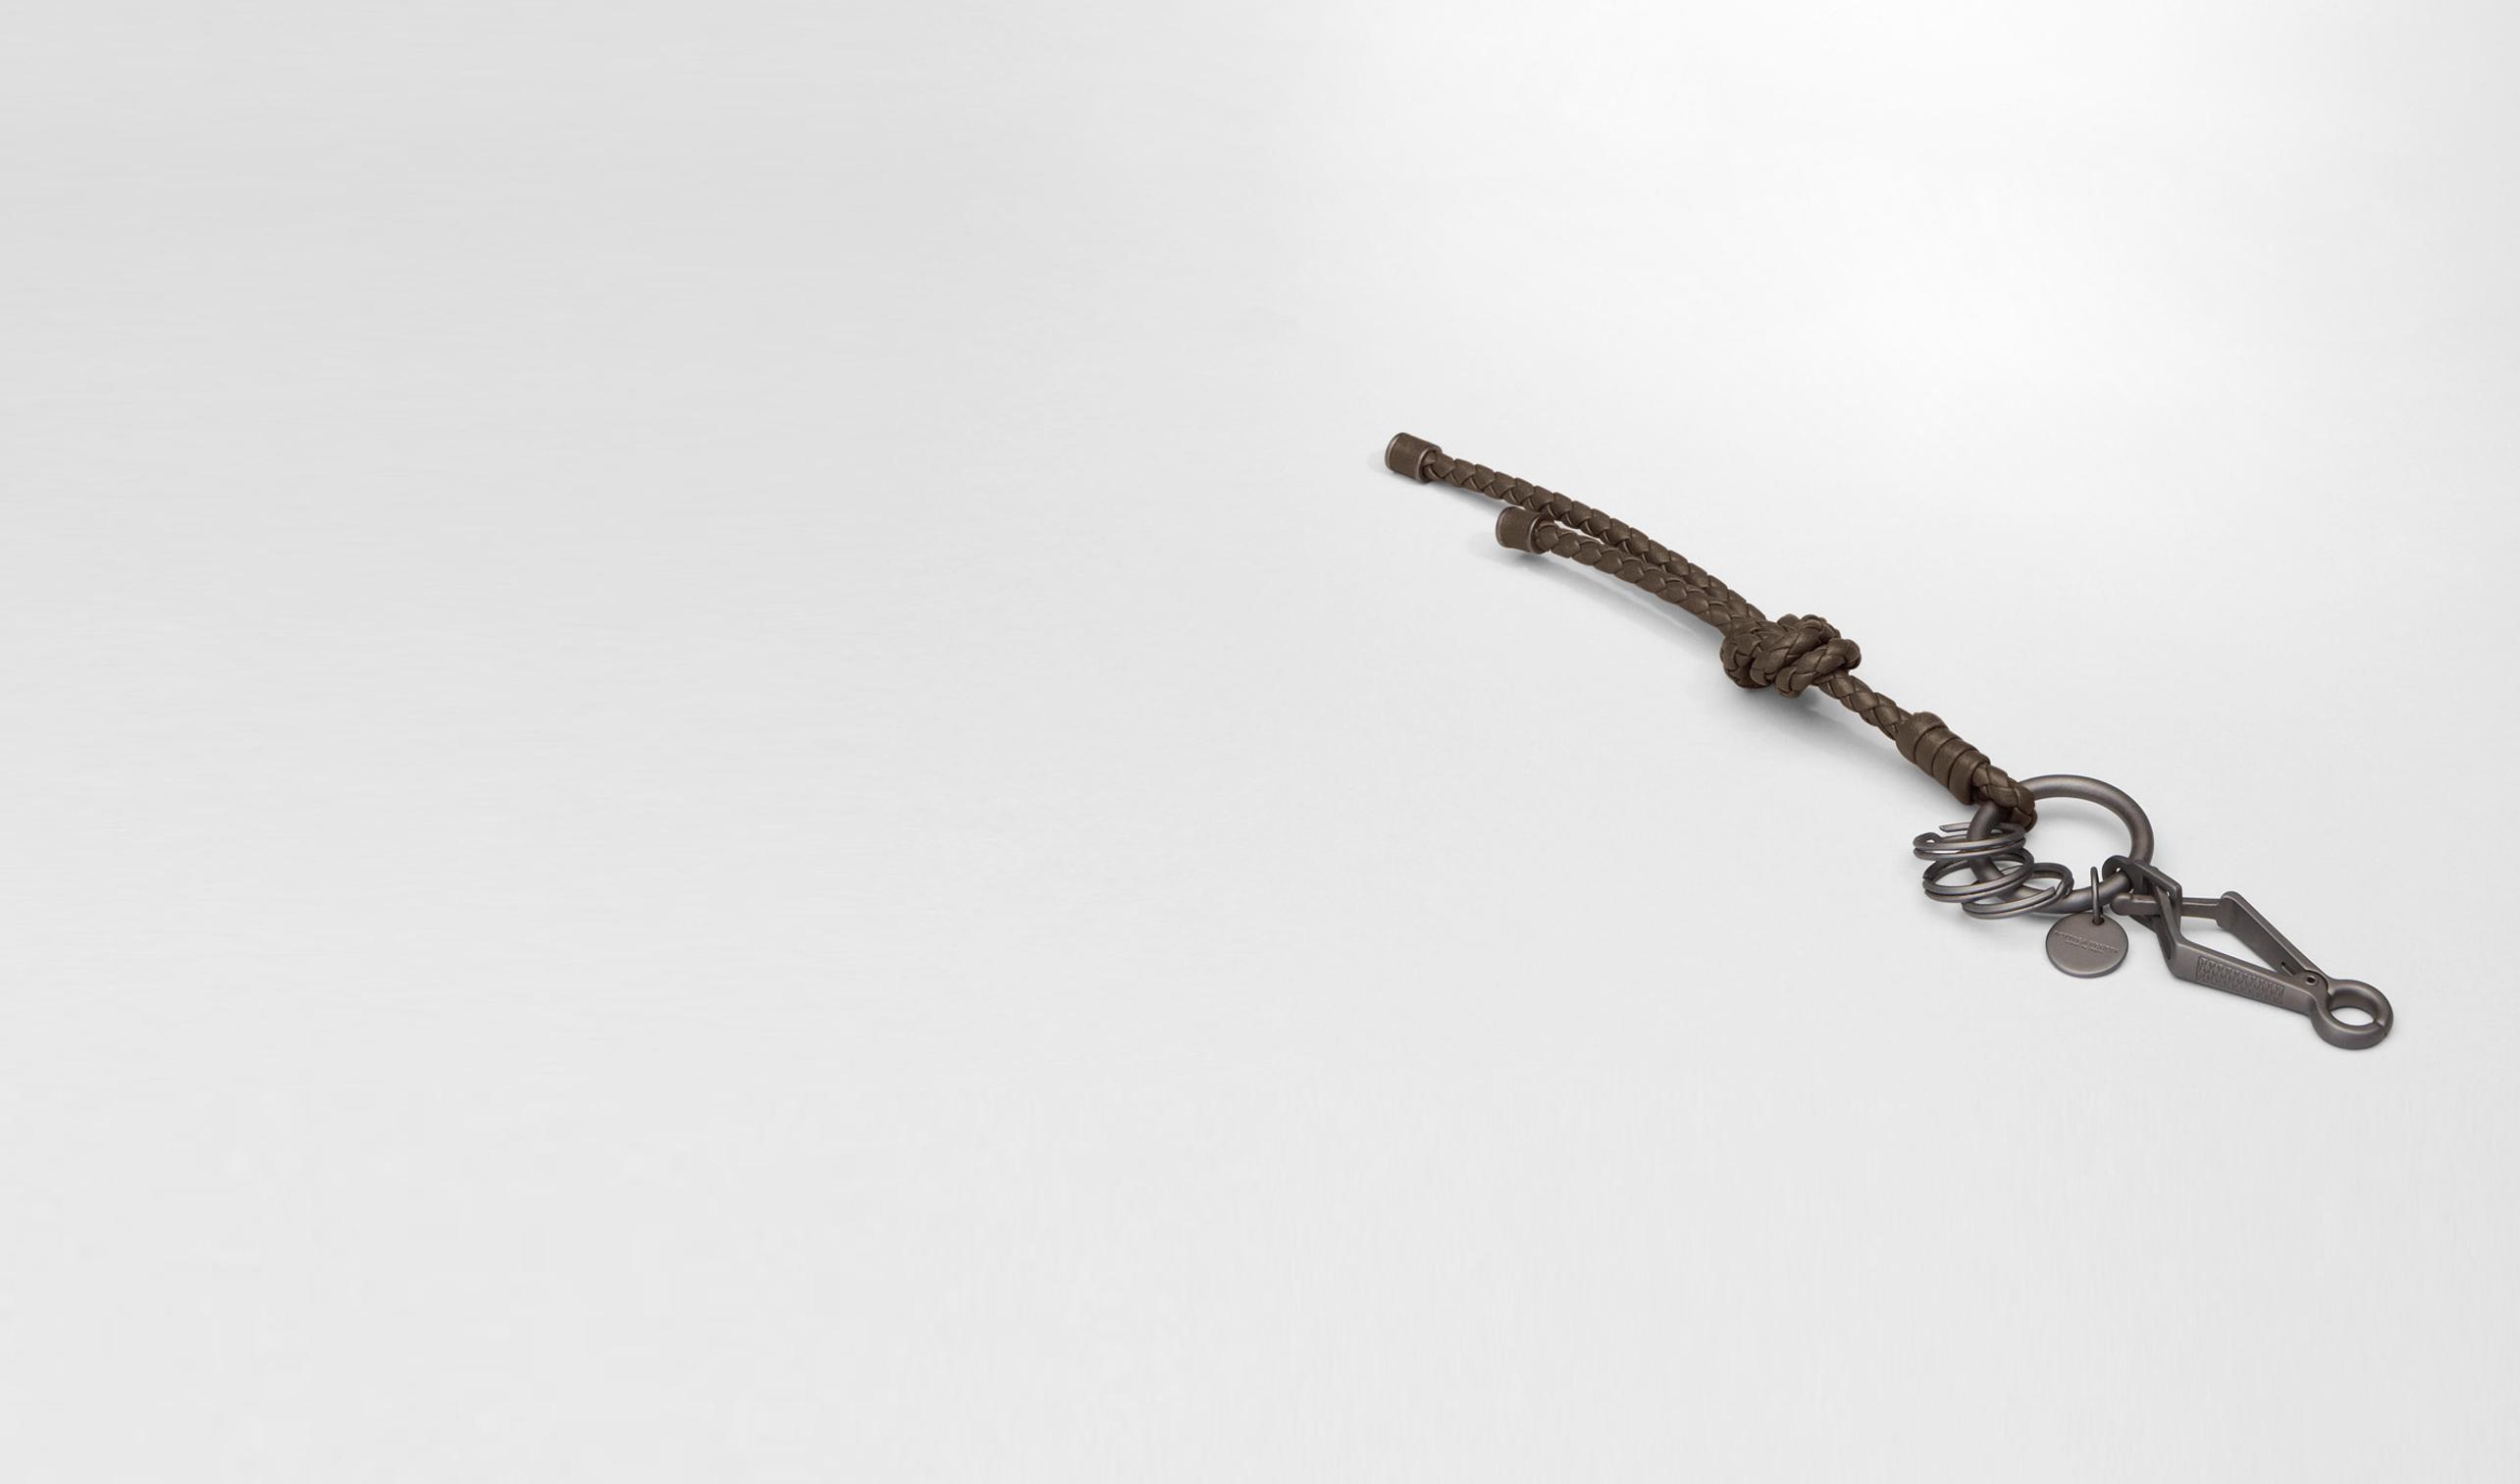 BOTTEGA VENETA Keyring or Bracelets E Edoardo Intrecciato Nappa Key Ring pl